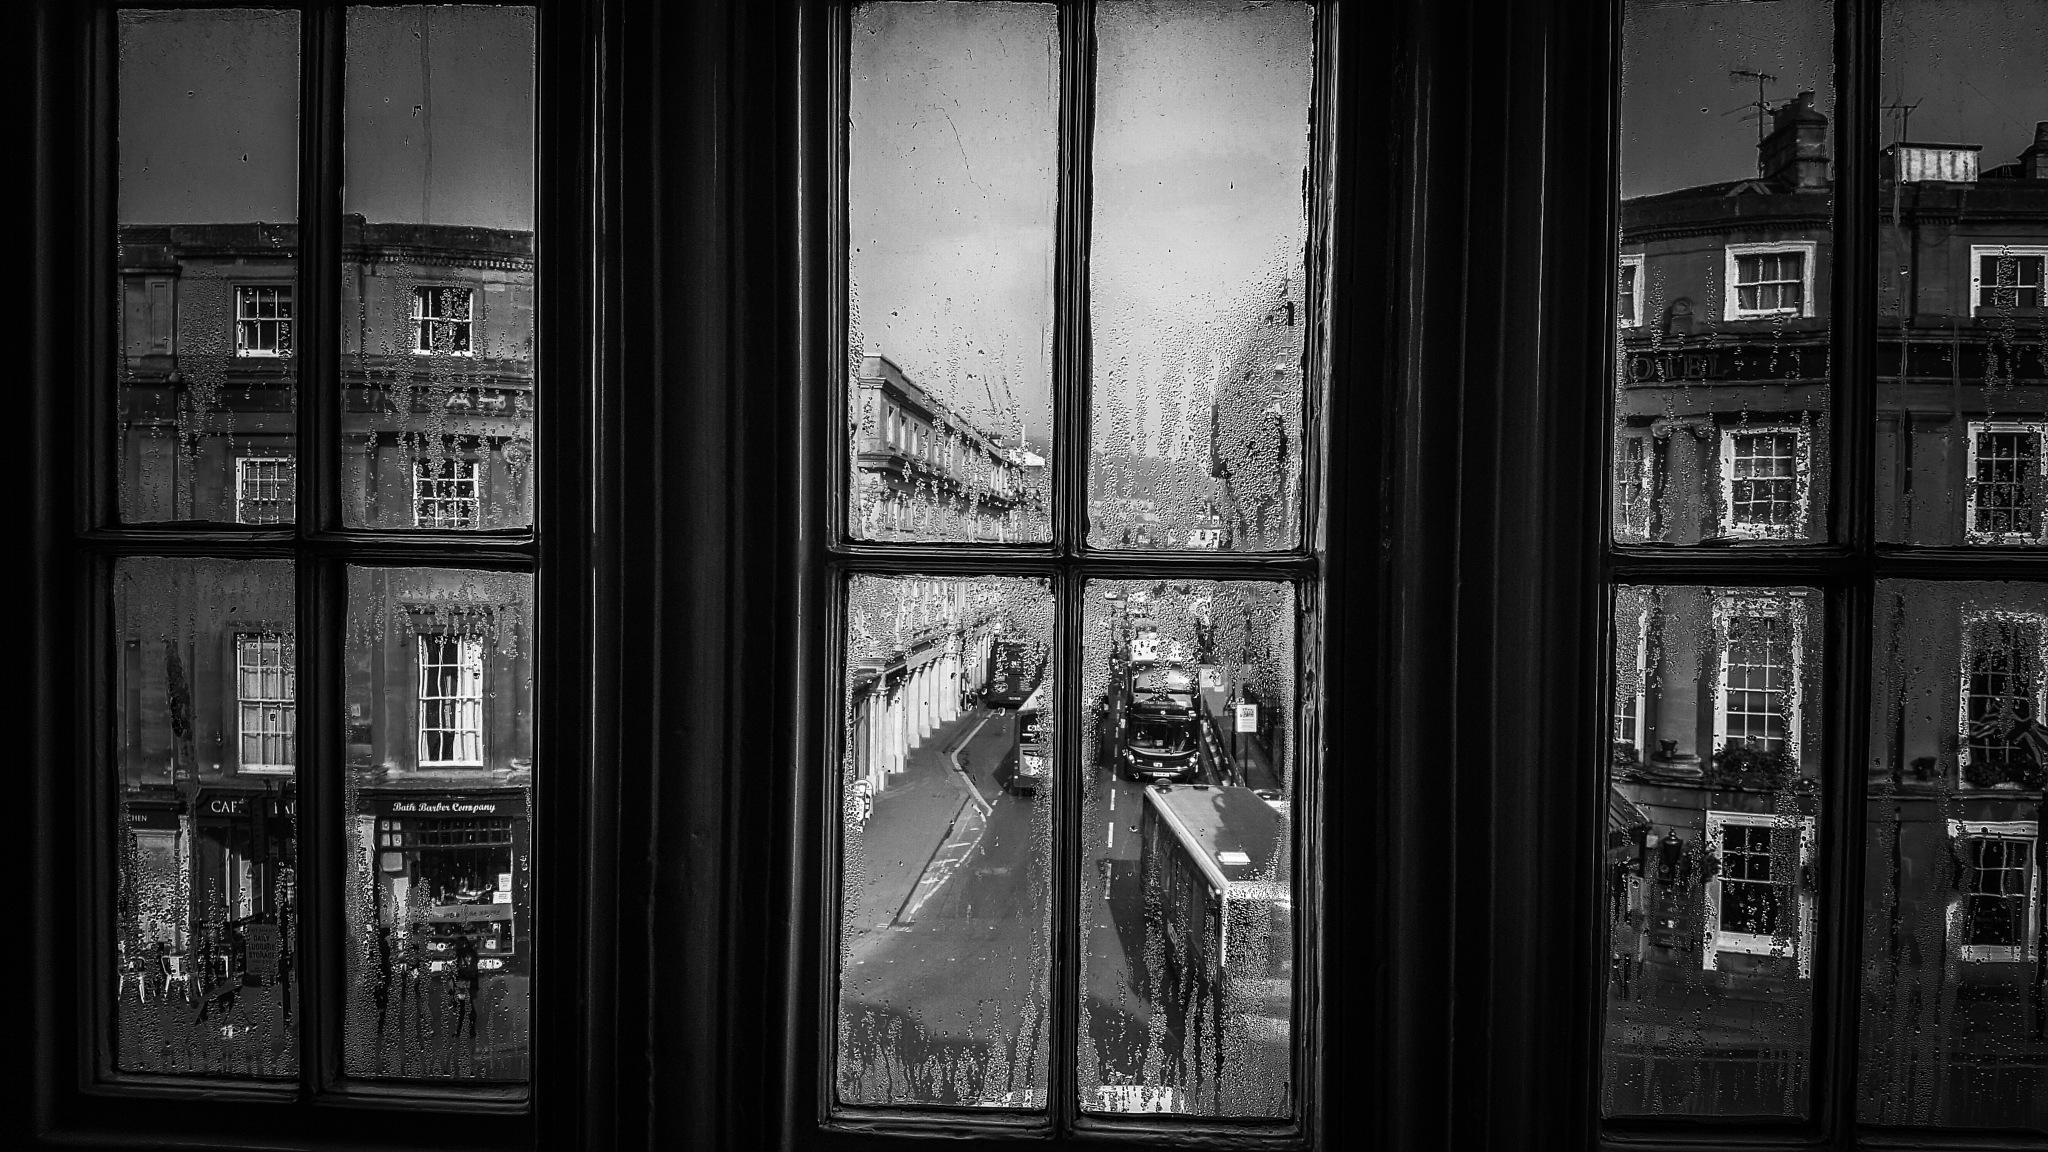 Room with a View by Wayil Rahmatalla